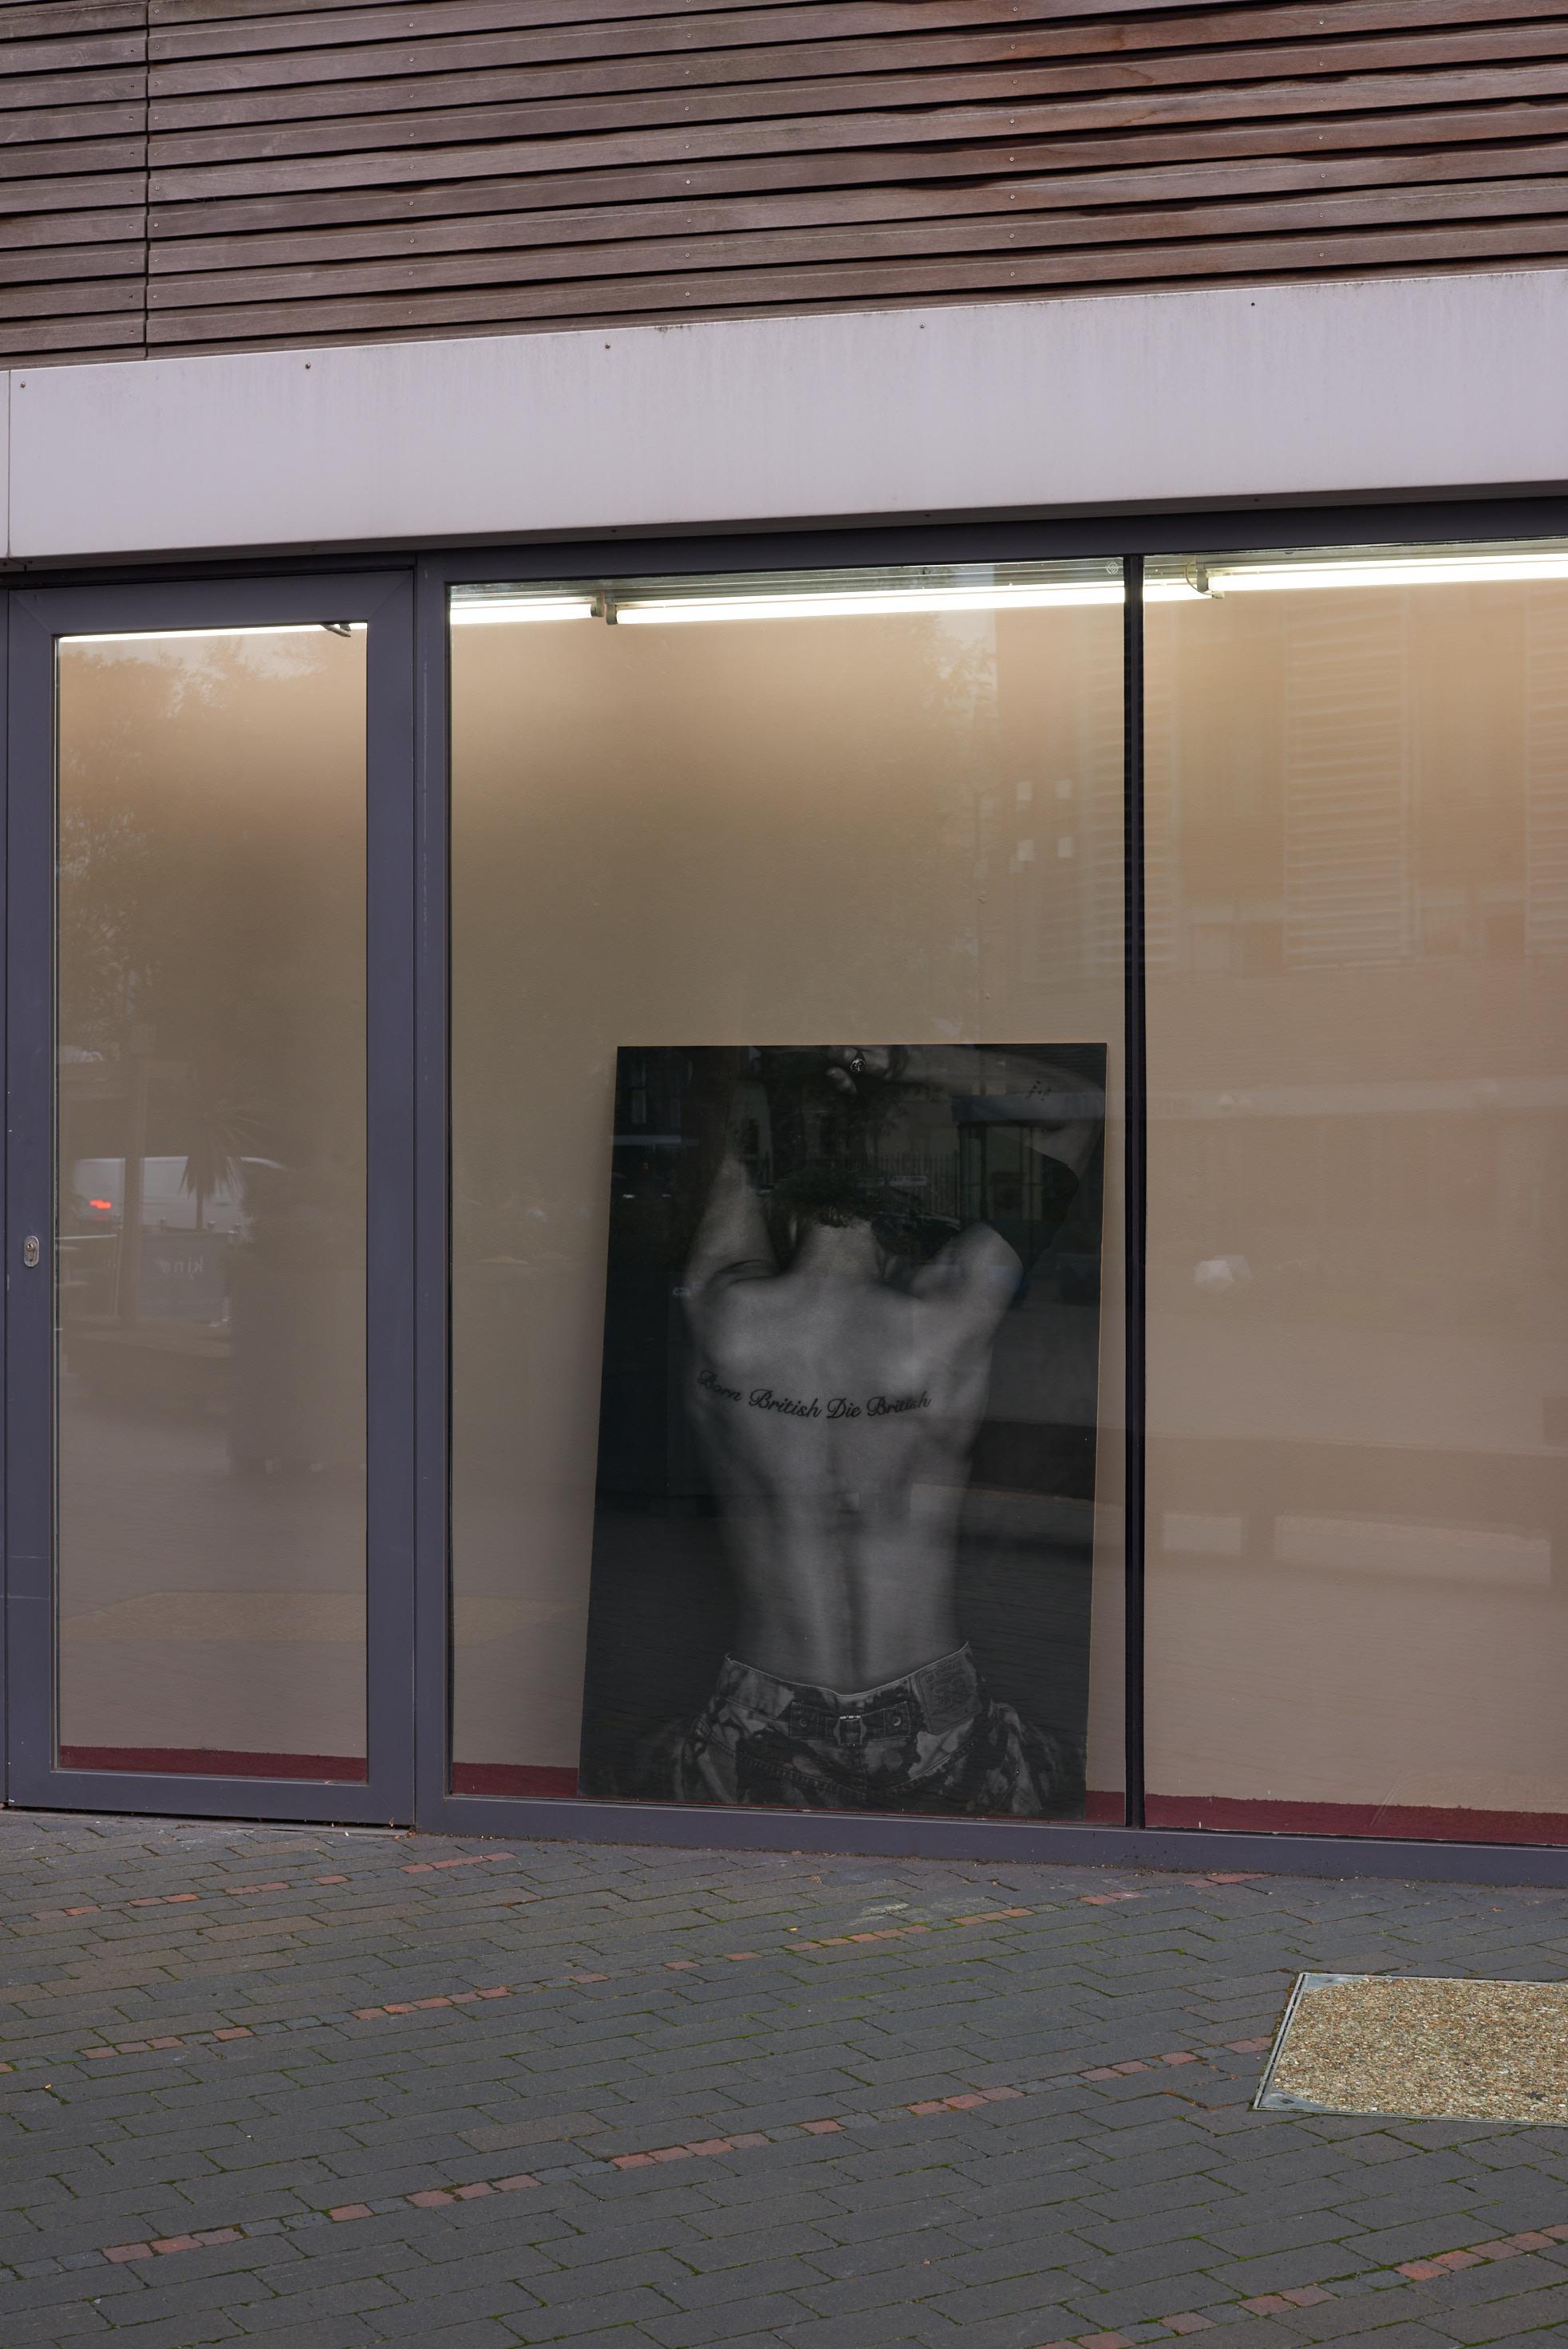 Rene Matić, Destination/Departure, 2020. Blueback photographic print mounted on MDF. Photographed by Derek Ridgers. 152 x 101 x 1 cm. Photographer: Jonathon Bassett.